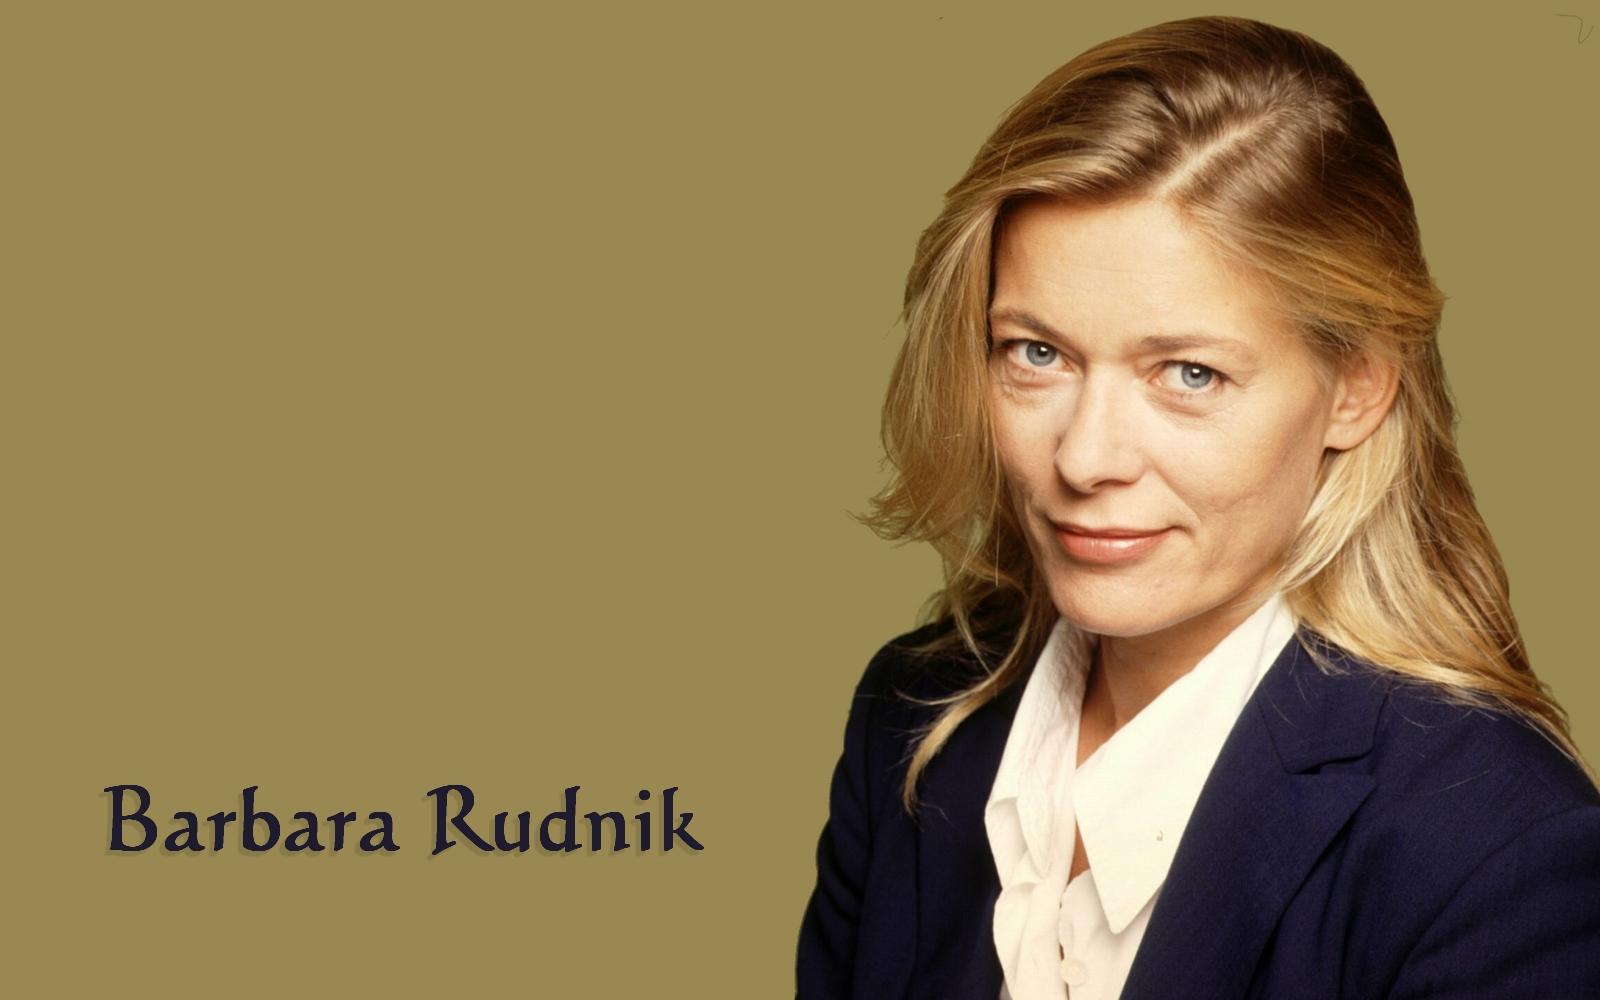 Barbara Rudnick